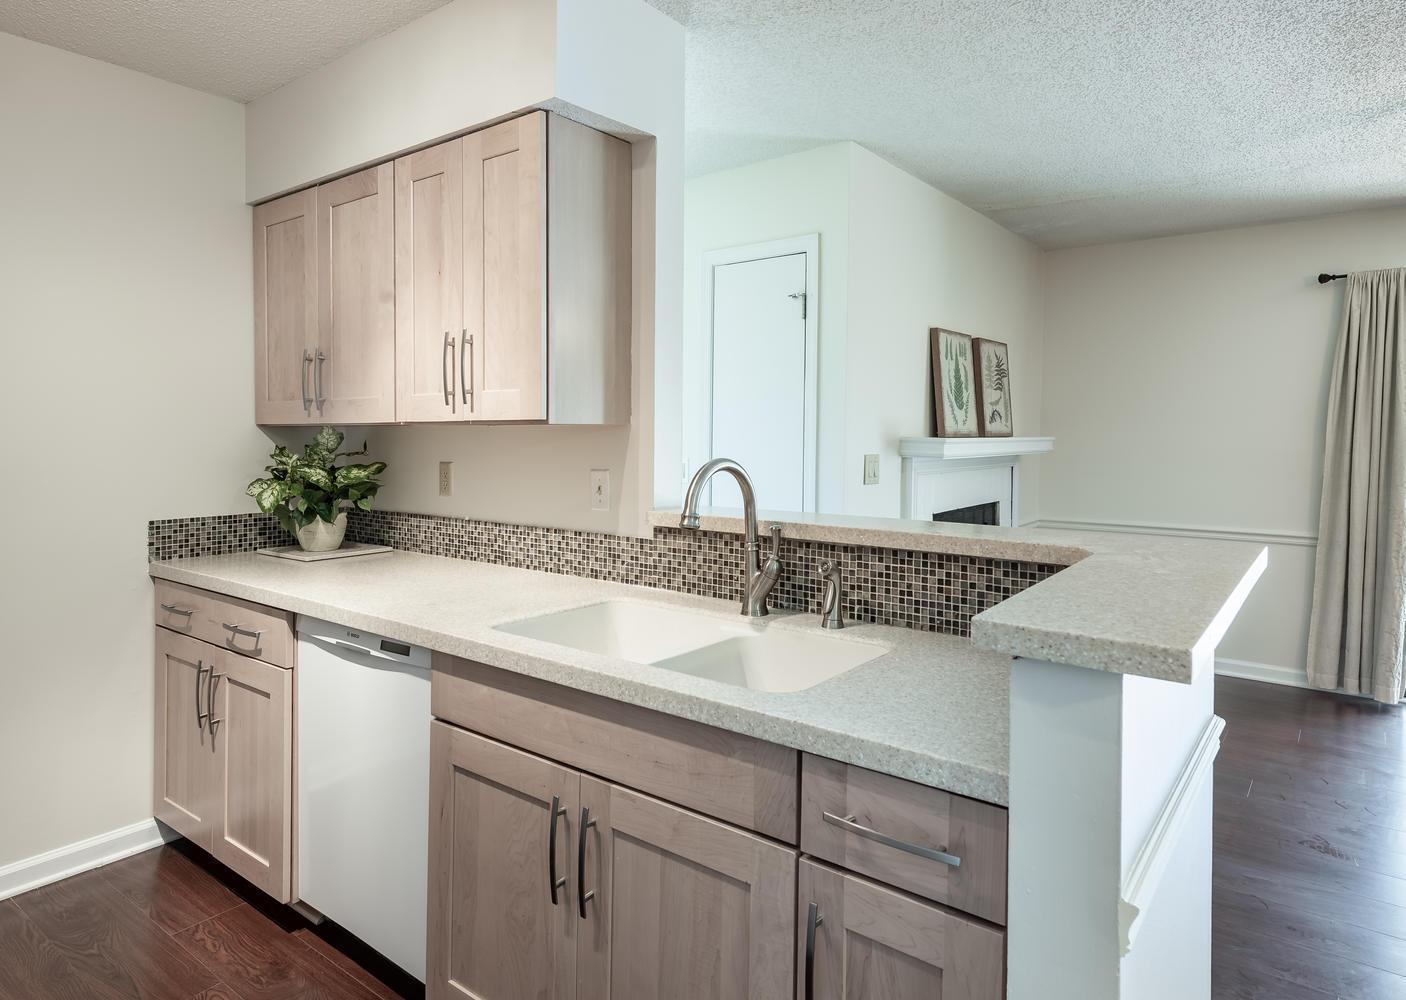 Hibben Ferry II Homes For Sale - 1054 Anna Knapp, Mount Pleasant, SC - 4